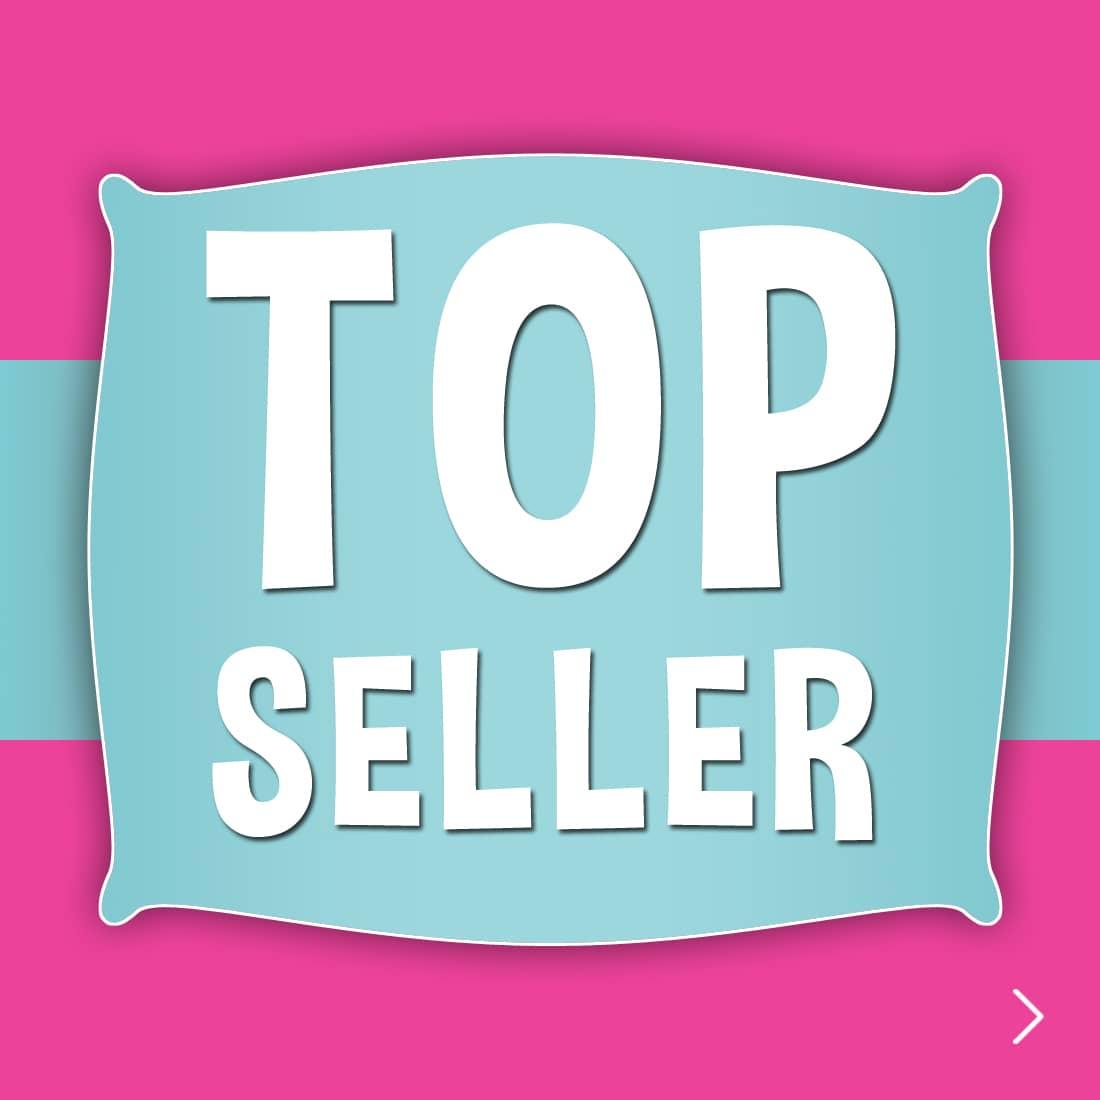 https://www.mifus.de/trend-themen/barbie/barbie-topseller/